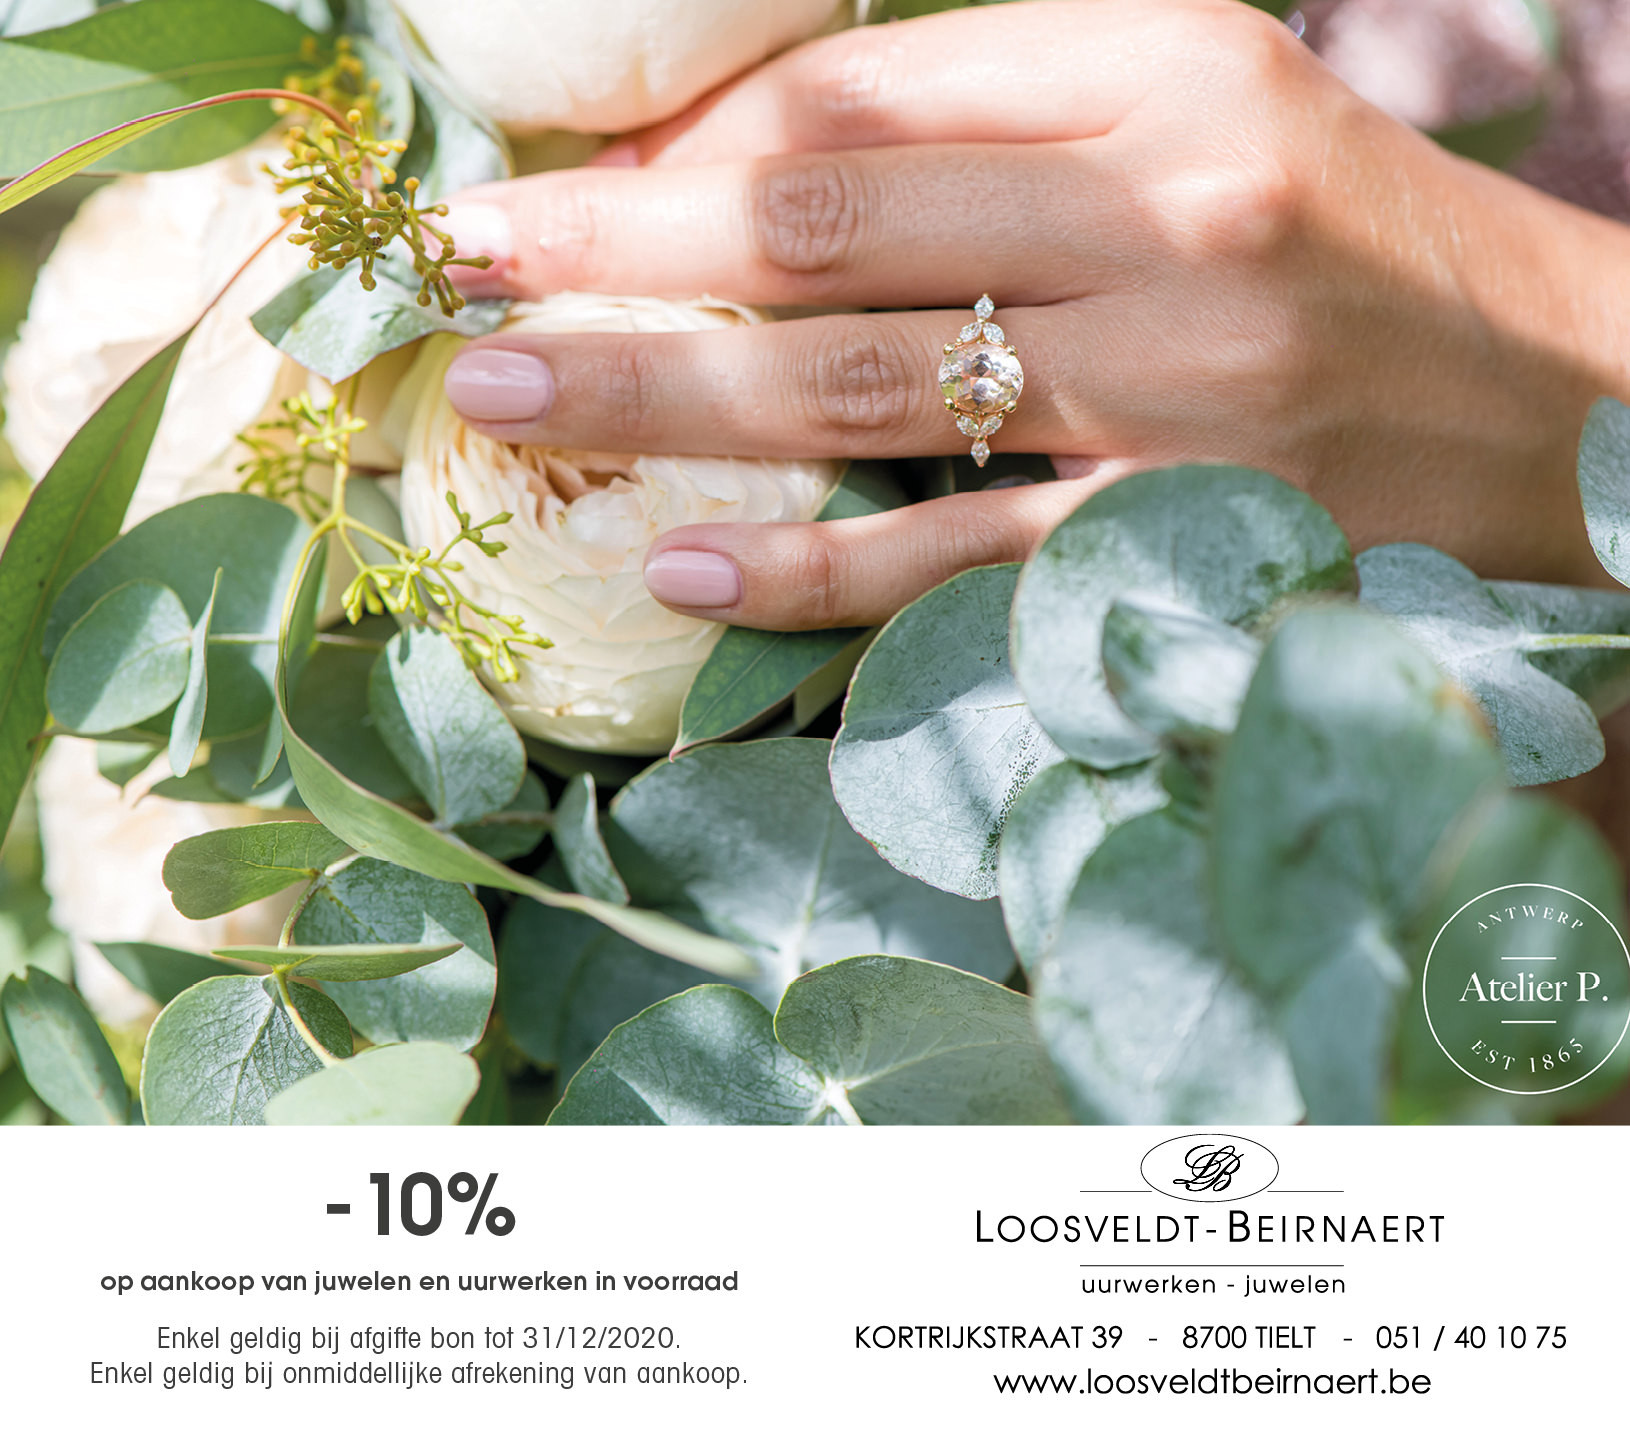 Juwelier Loosveldt